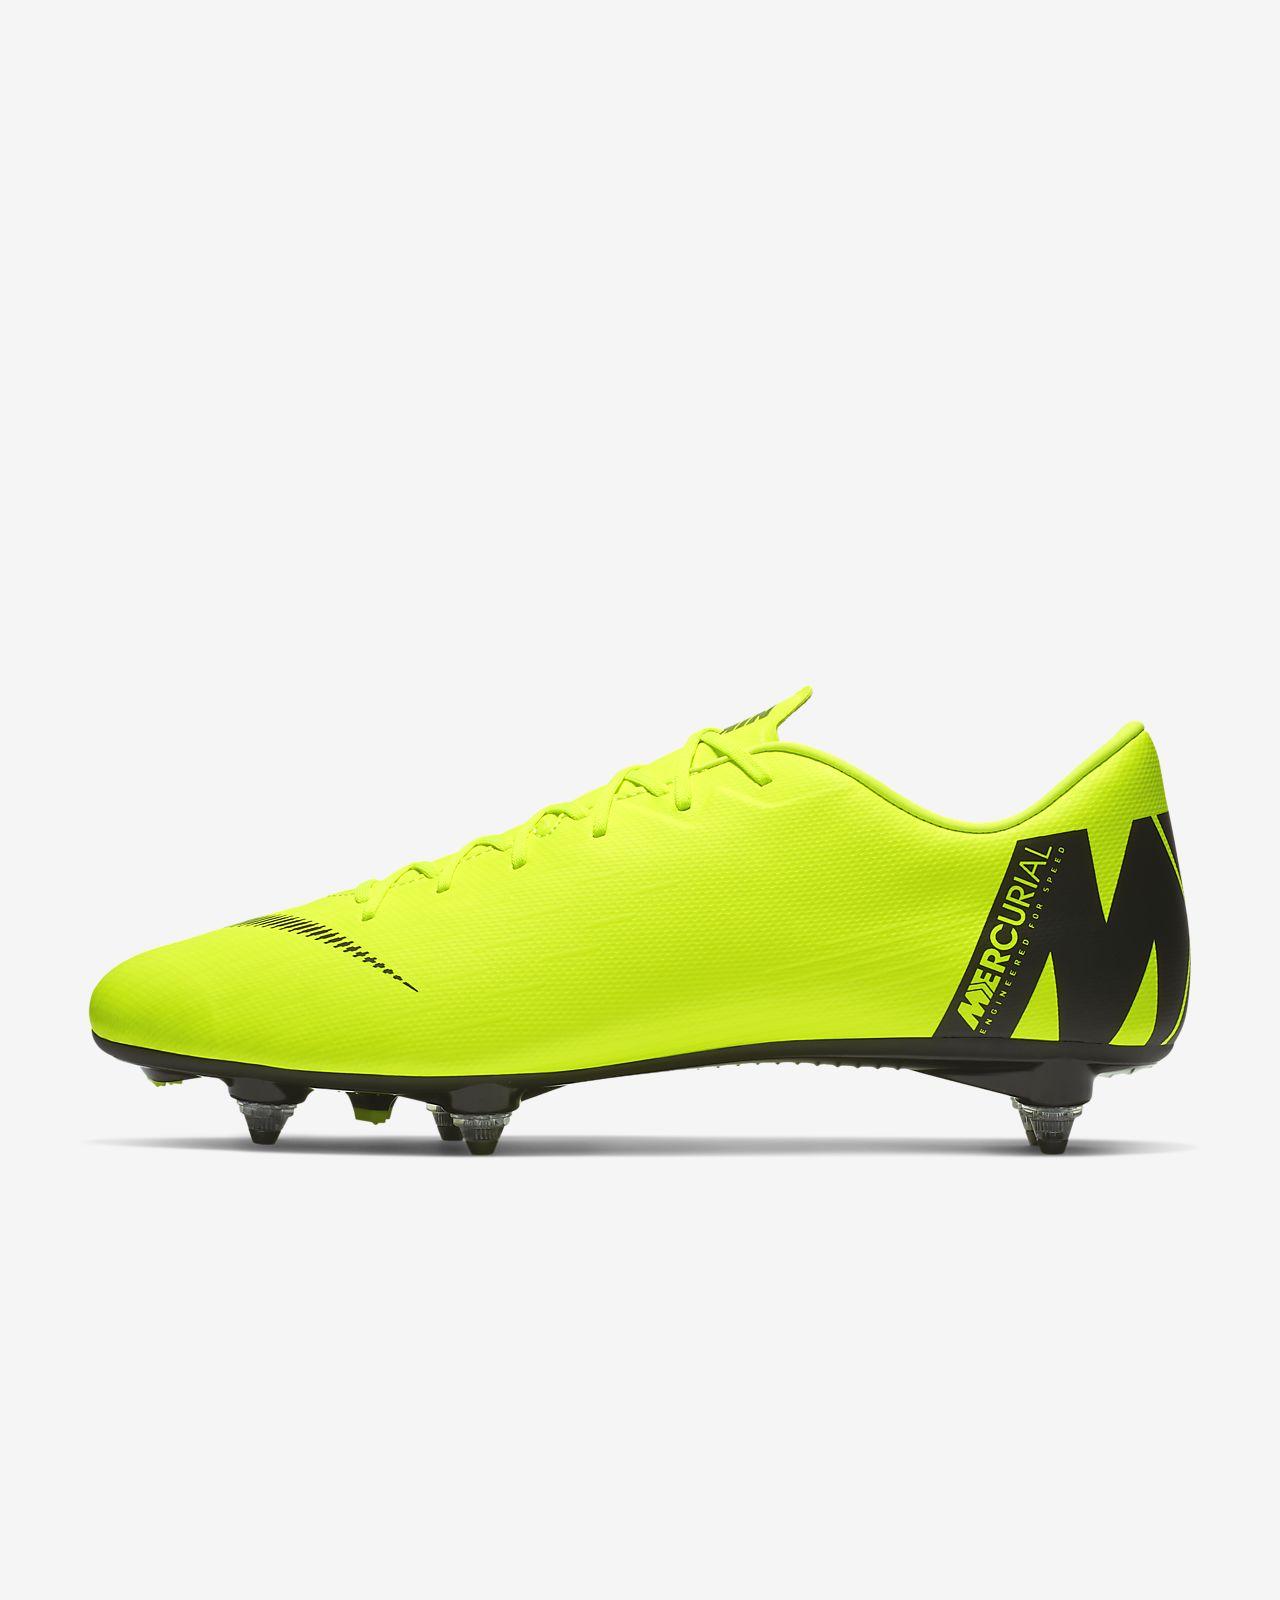 Xii Para Terreno Mercurial Fútbol Nike Vapor Blando De Calzado 4w8SqTg